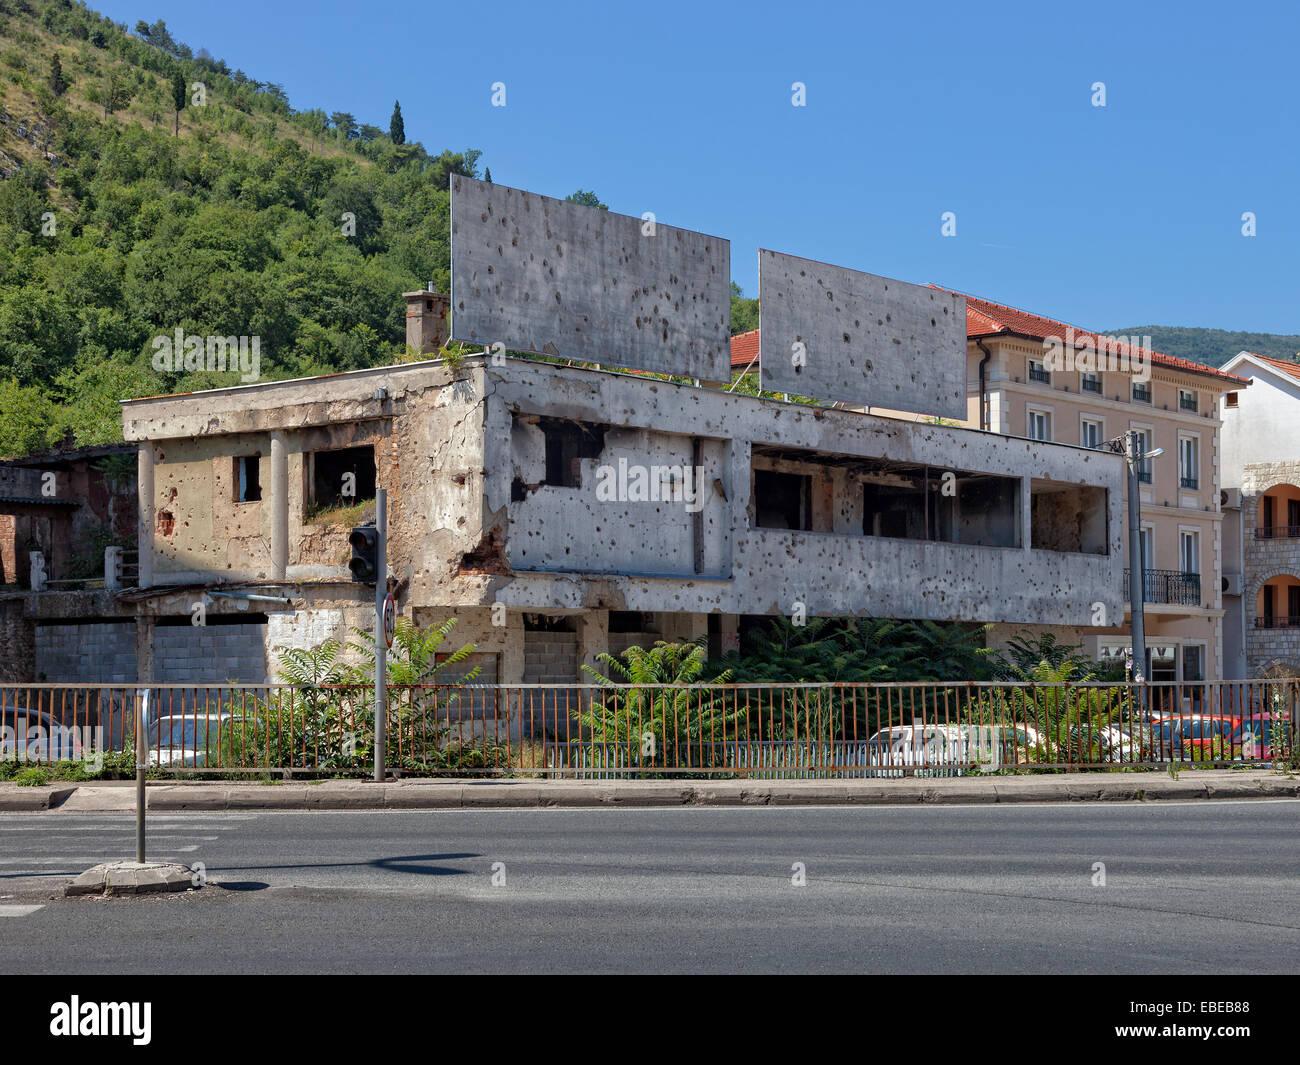 Old destroyed building after war in Mostar, Bosnia and Herzegovina. - Stock Image